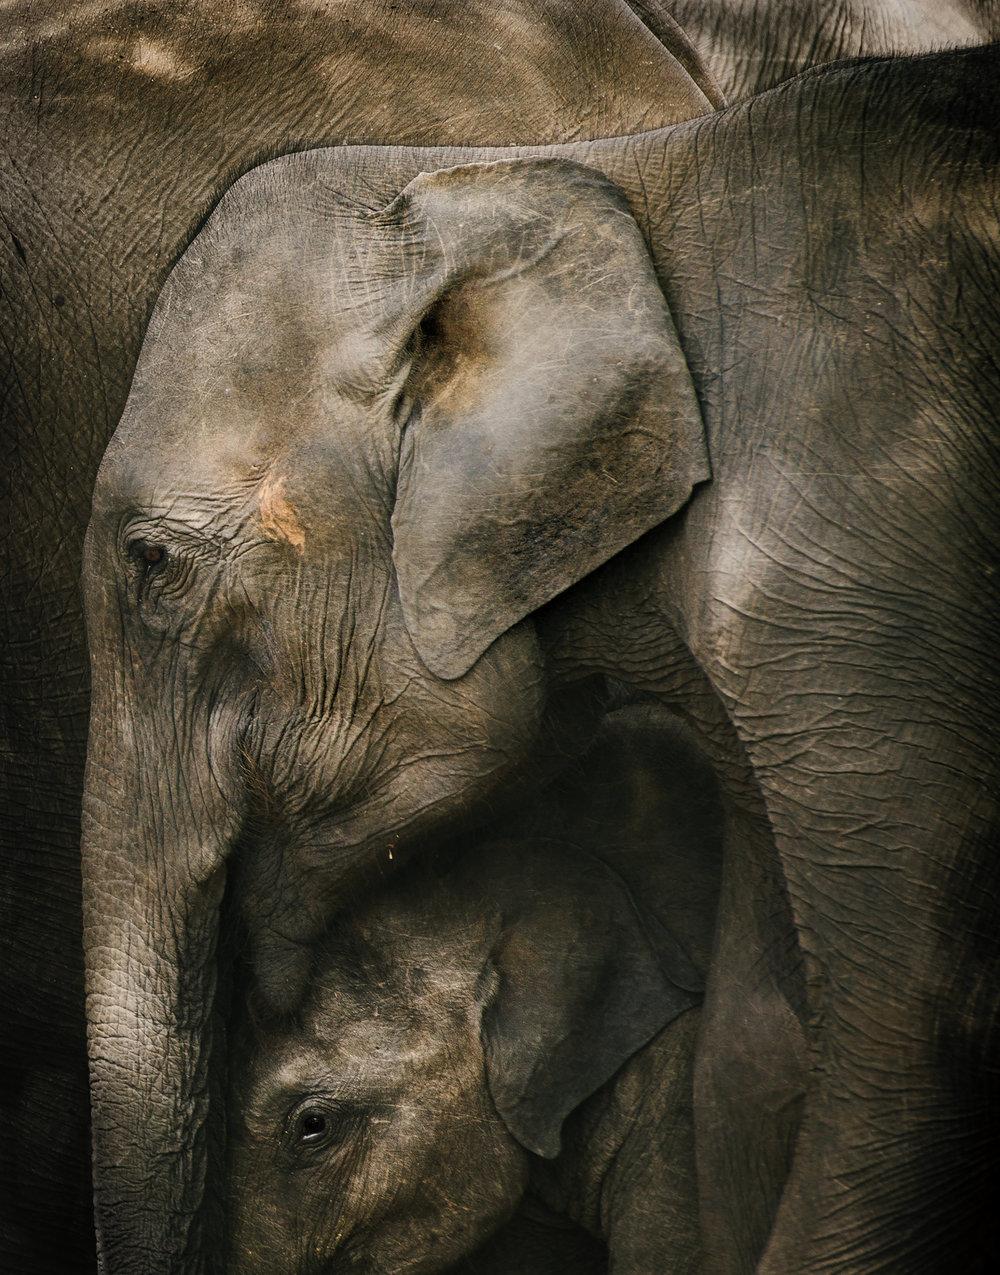 101_ELEPHANTS.JPG